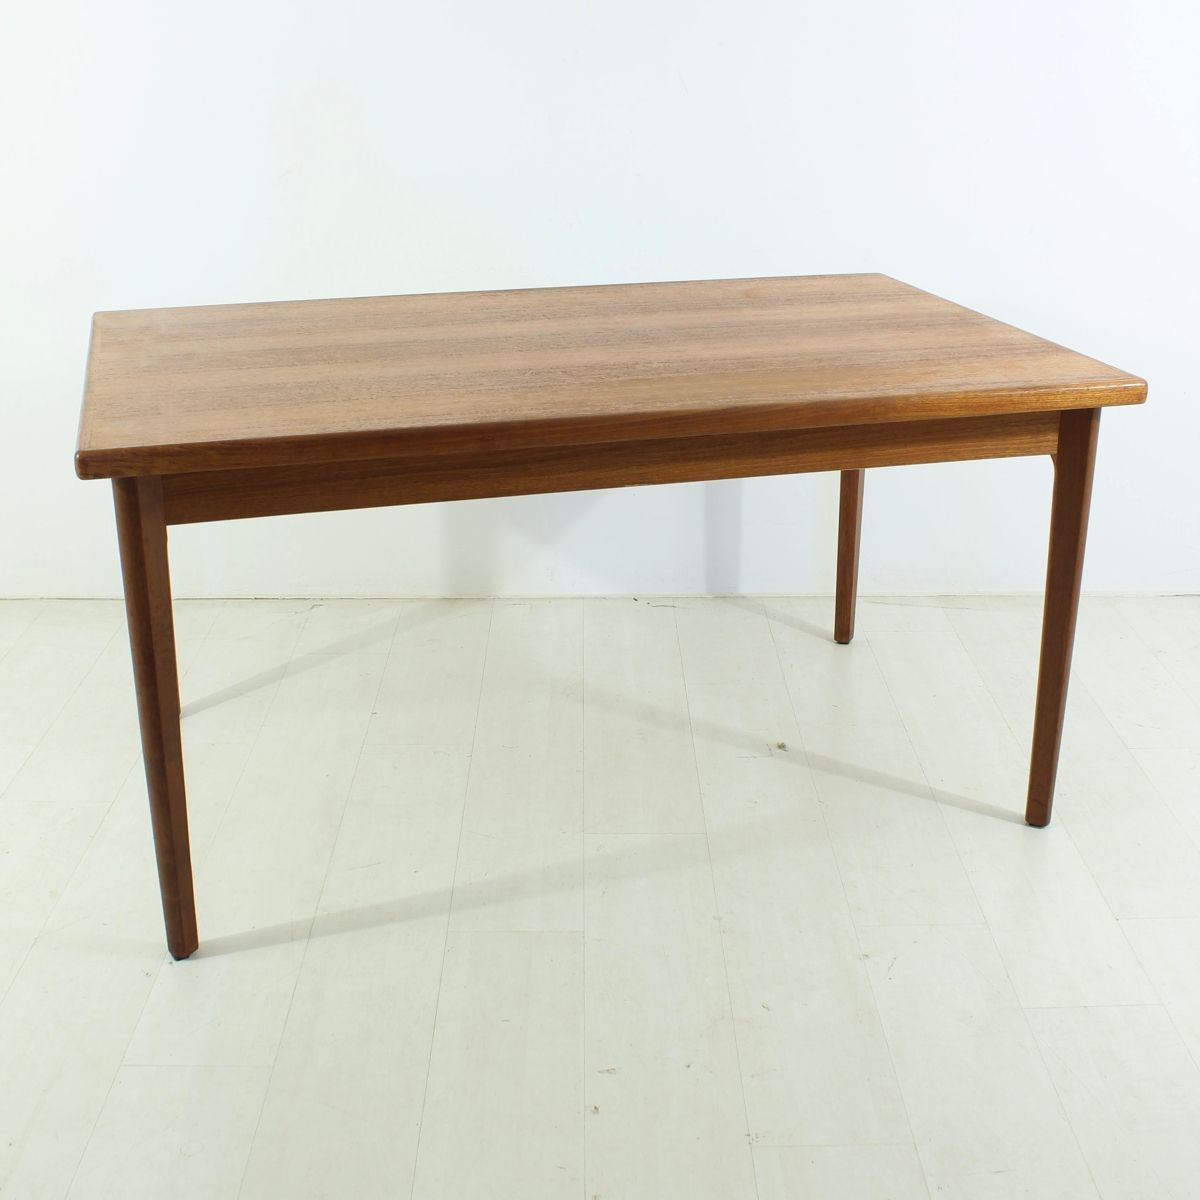 Vintage Danish Extending Teak Dining Table from BRDR Furbo for